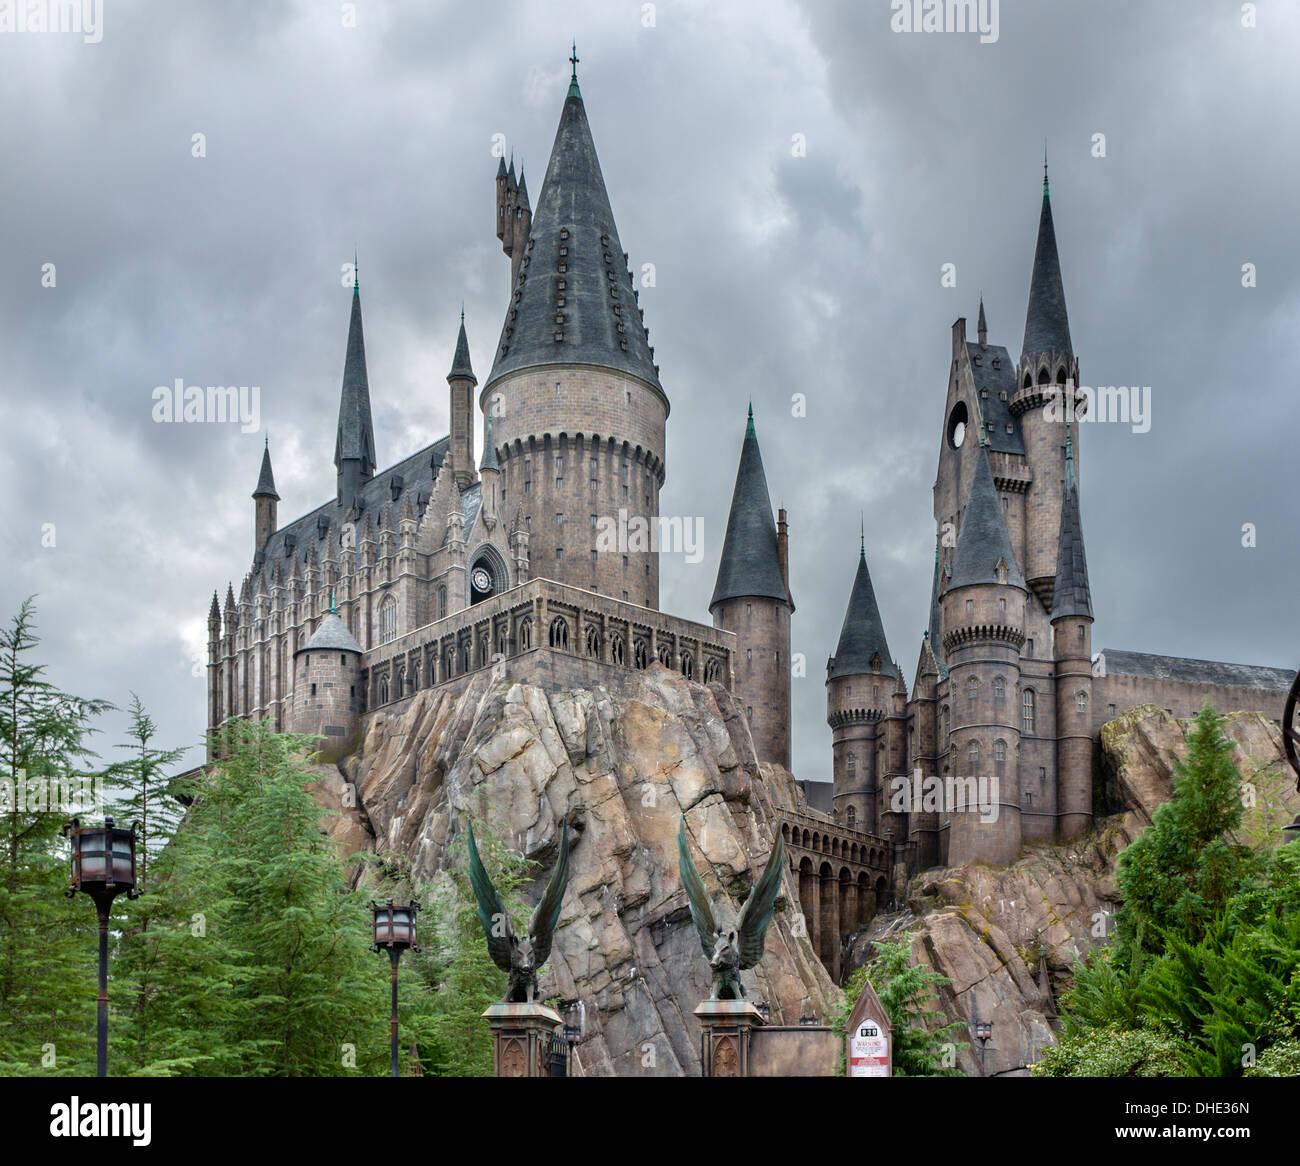 Hogwarts Castle, Wizarding World of Harry Potter, Islands of Adventure, Universal Orlando Resort, Orlando, Central Florida, USA - Stock Image